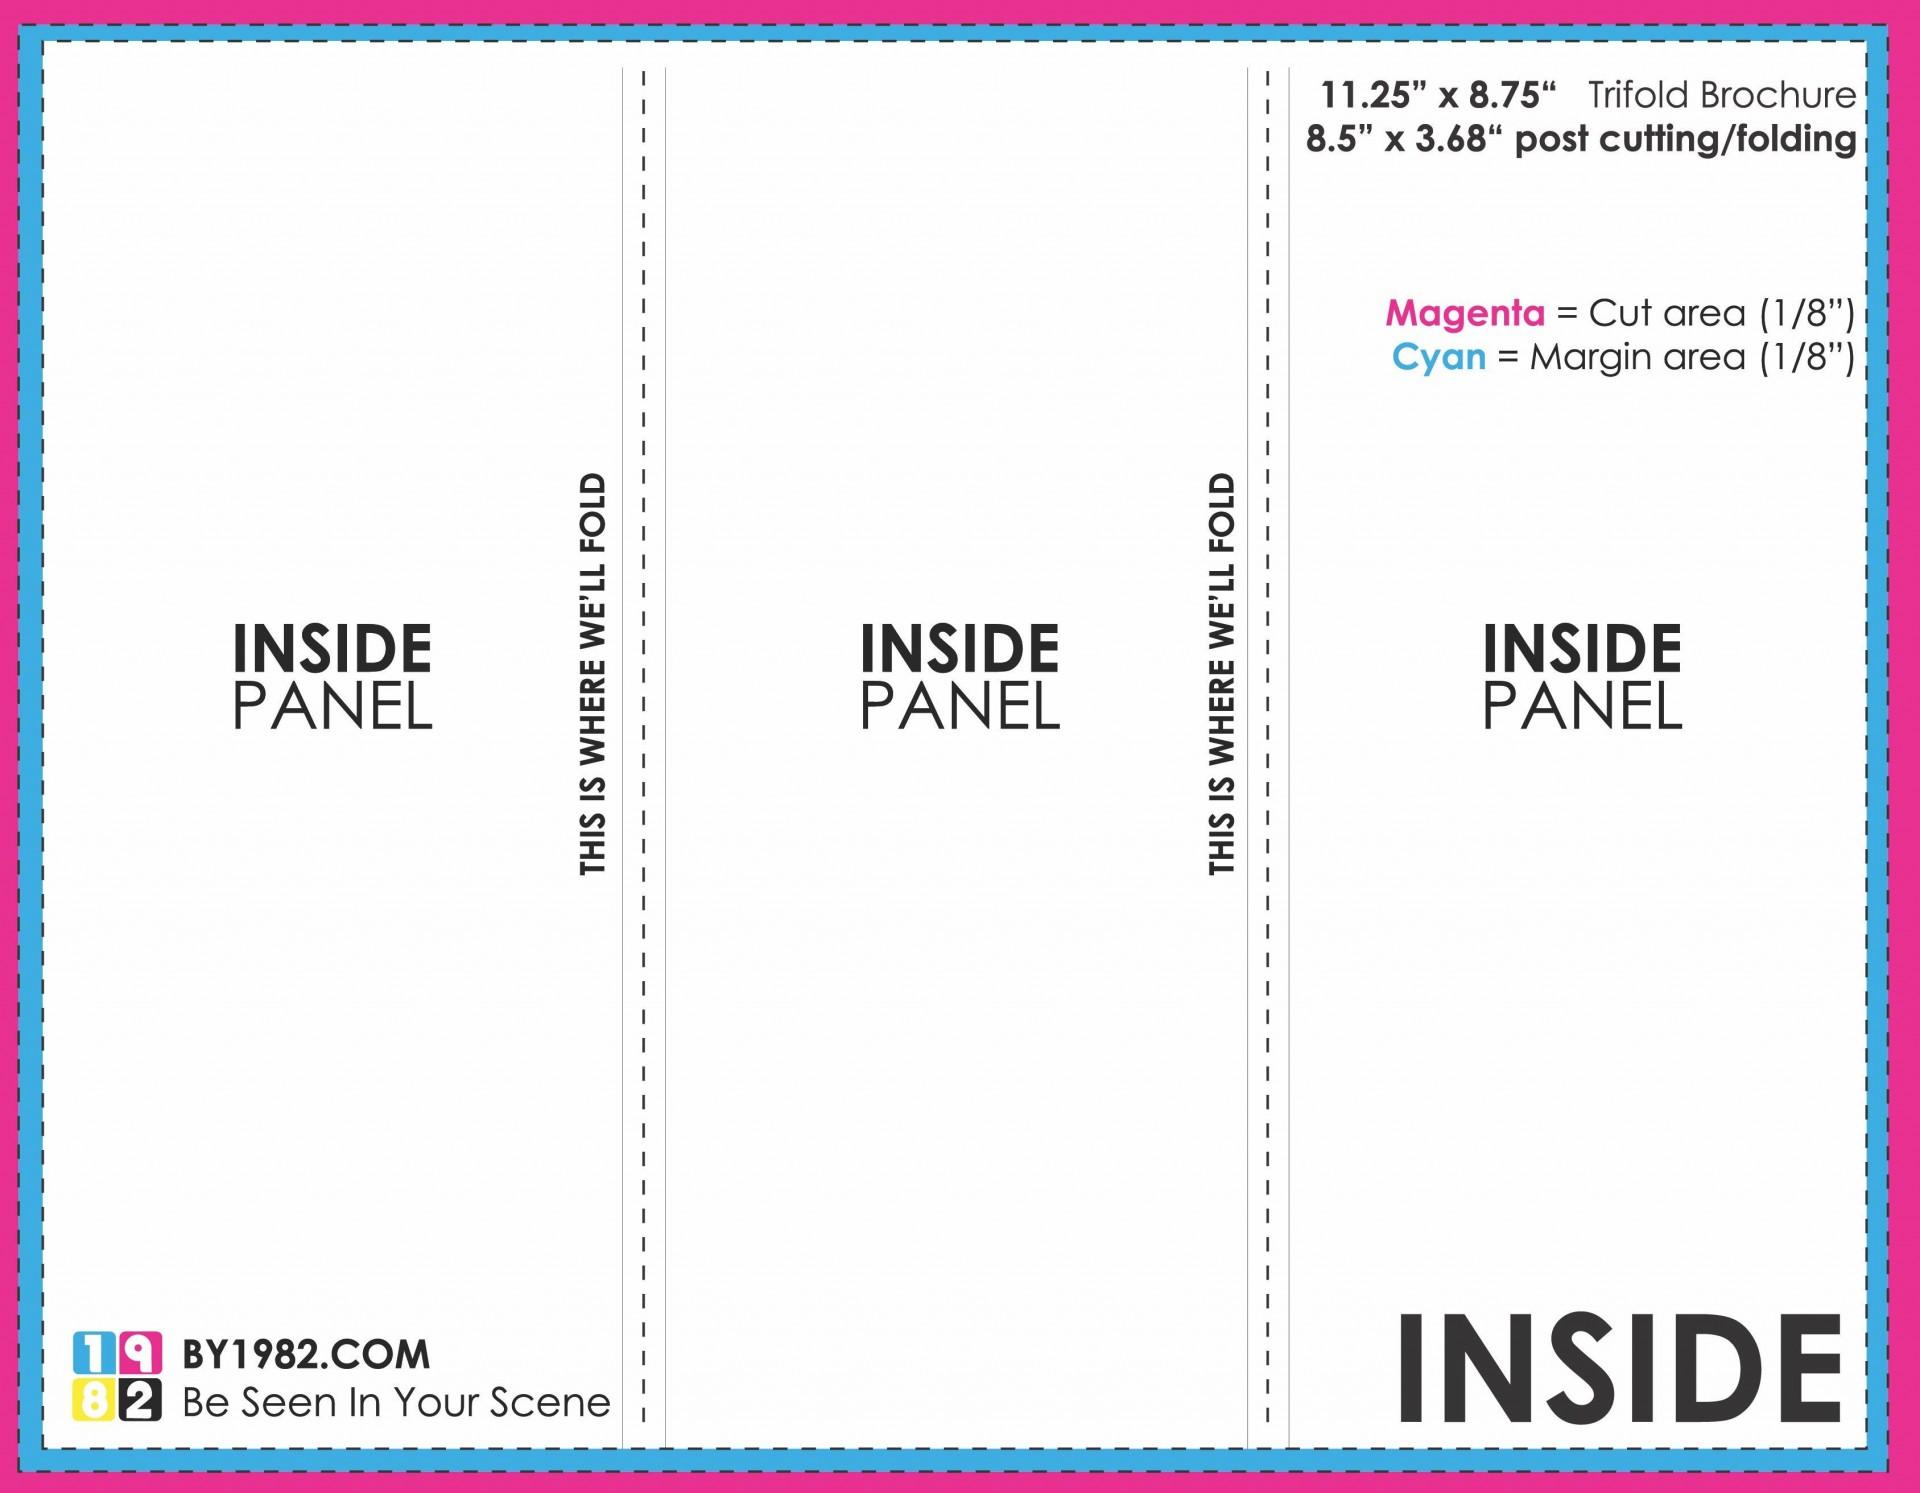 001 Impressive Brochure Template For Google Doc Highest Quality  Docs Download 3 Panel Free1920